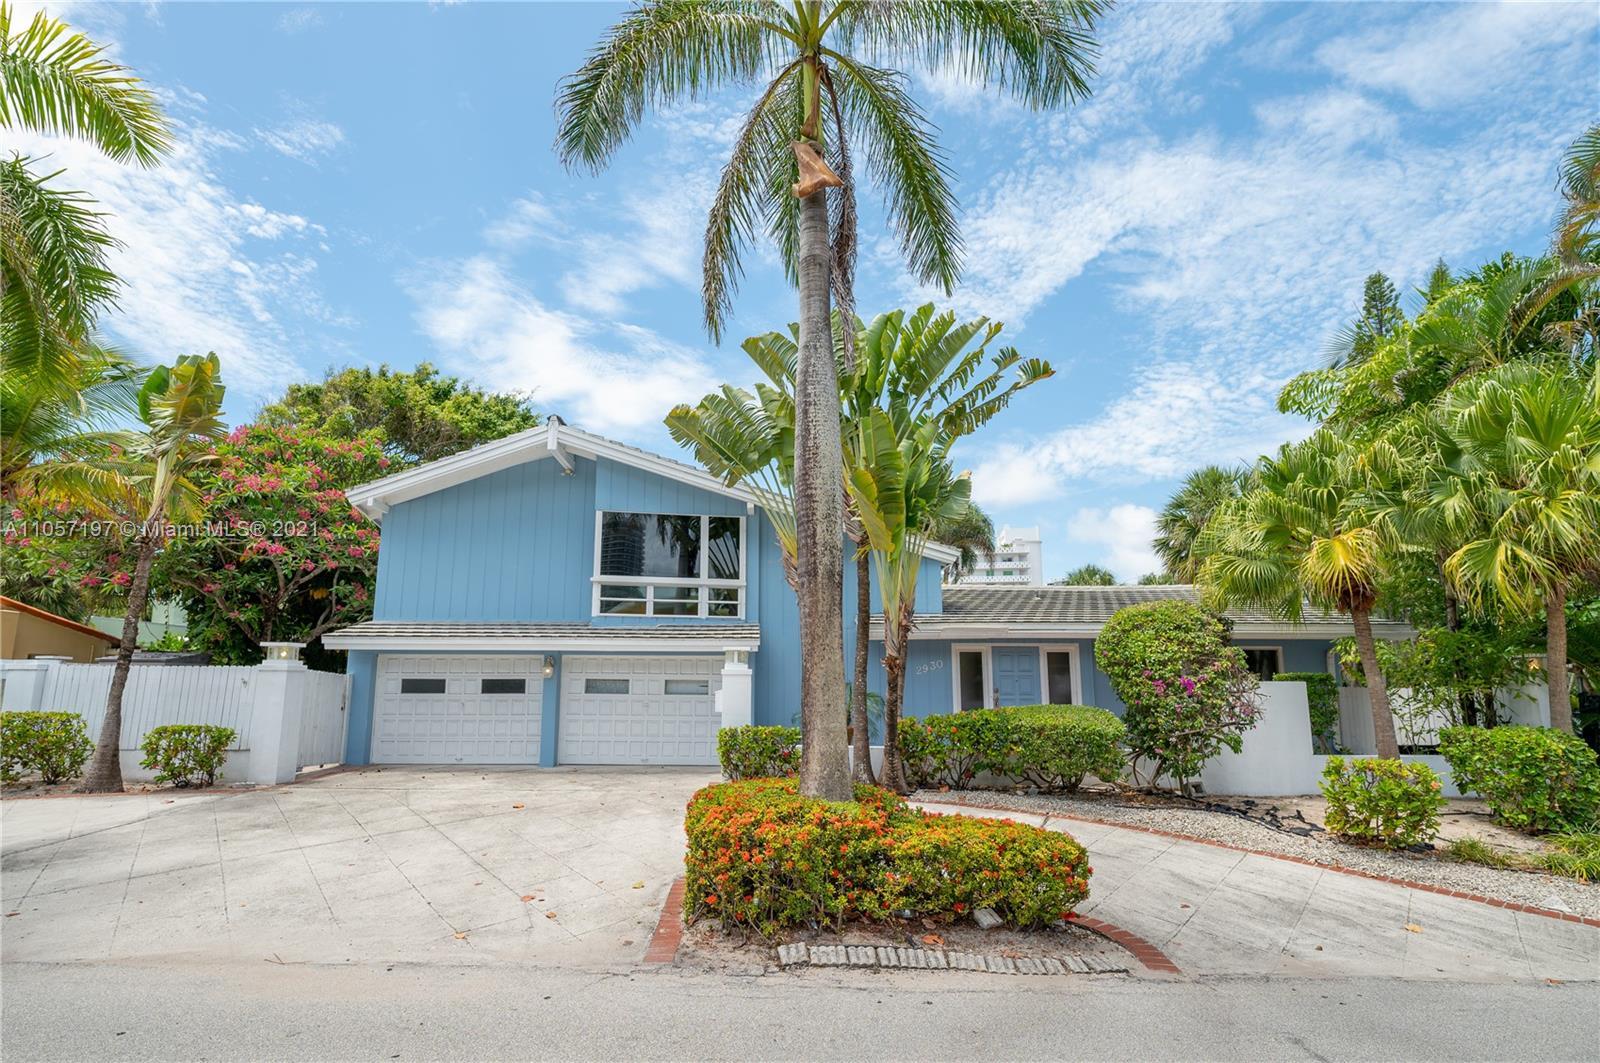 Lauderdale Beach - 2930 Center Ave, Fort Lauderdale, FL 33308